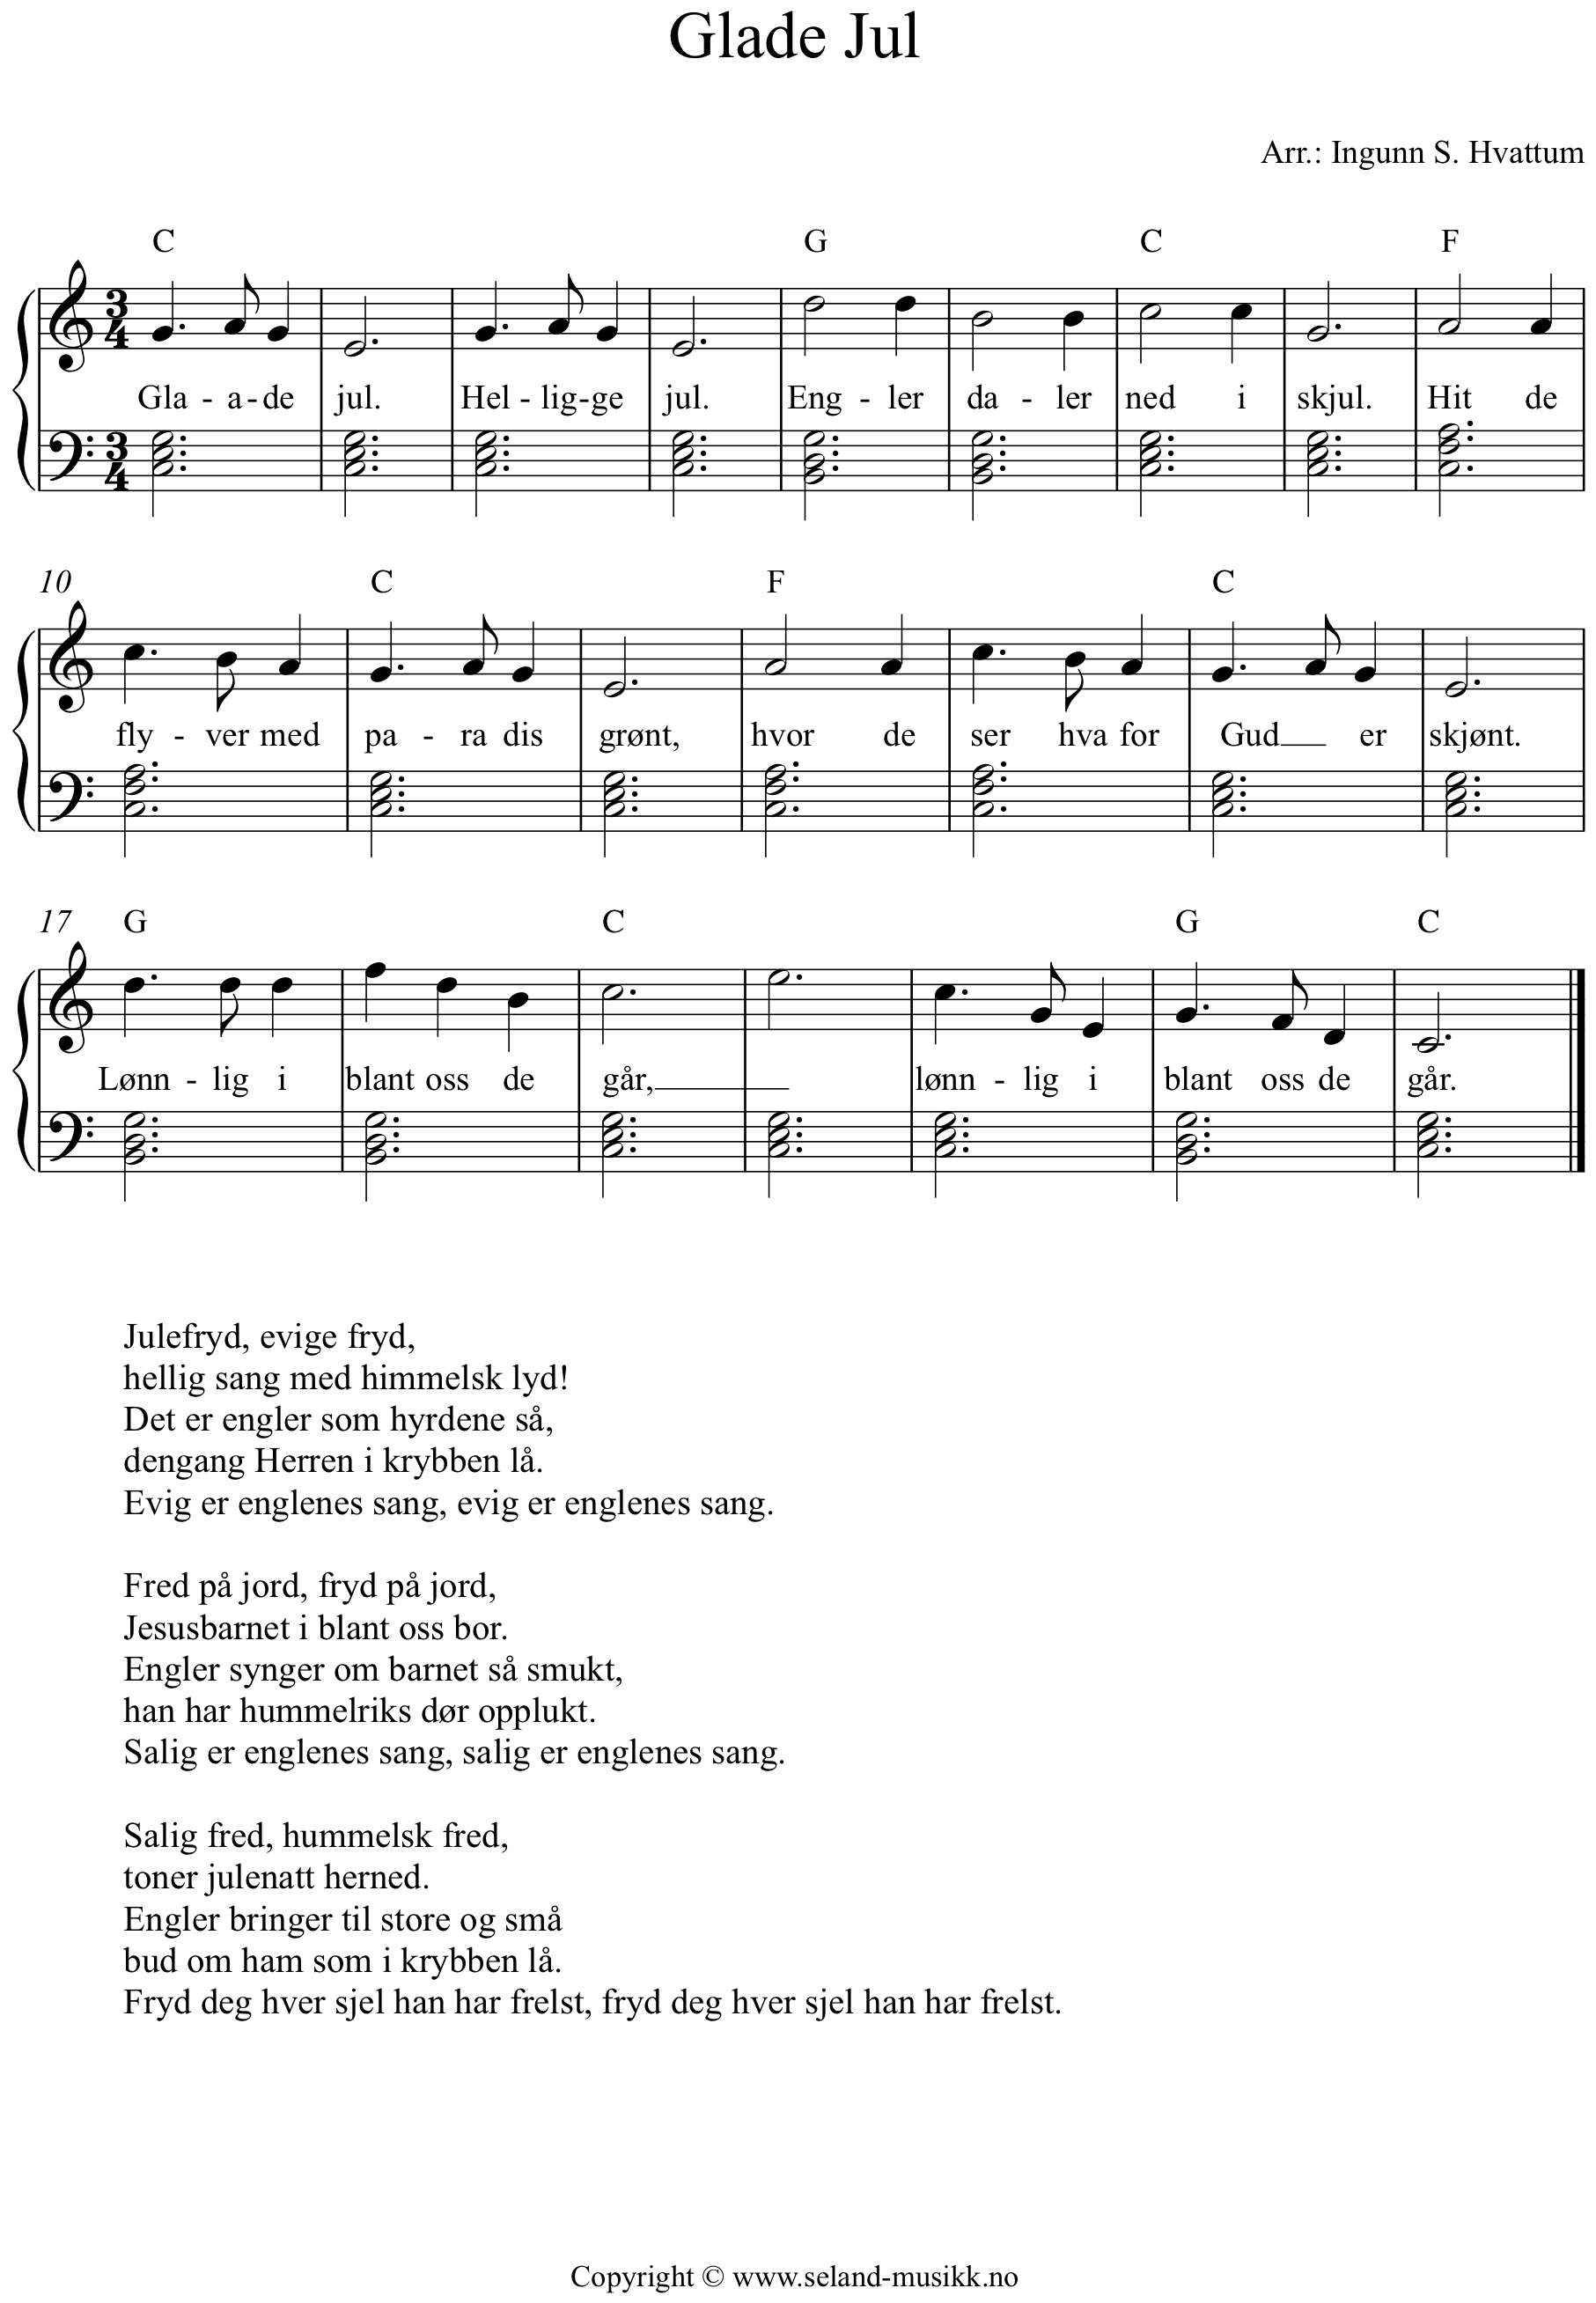 glade jul noter piano